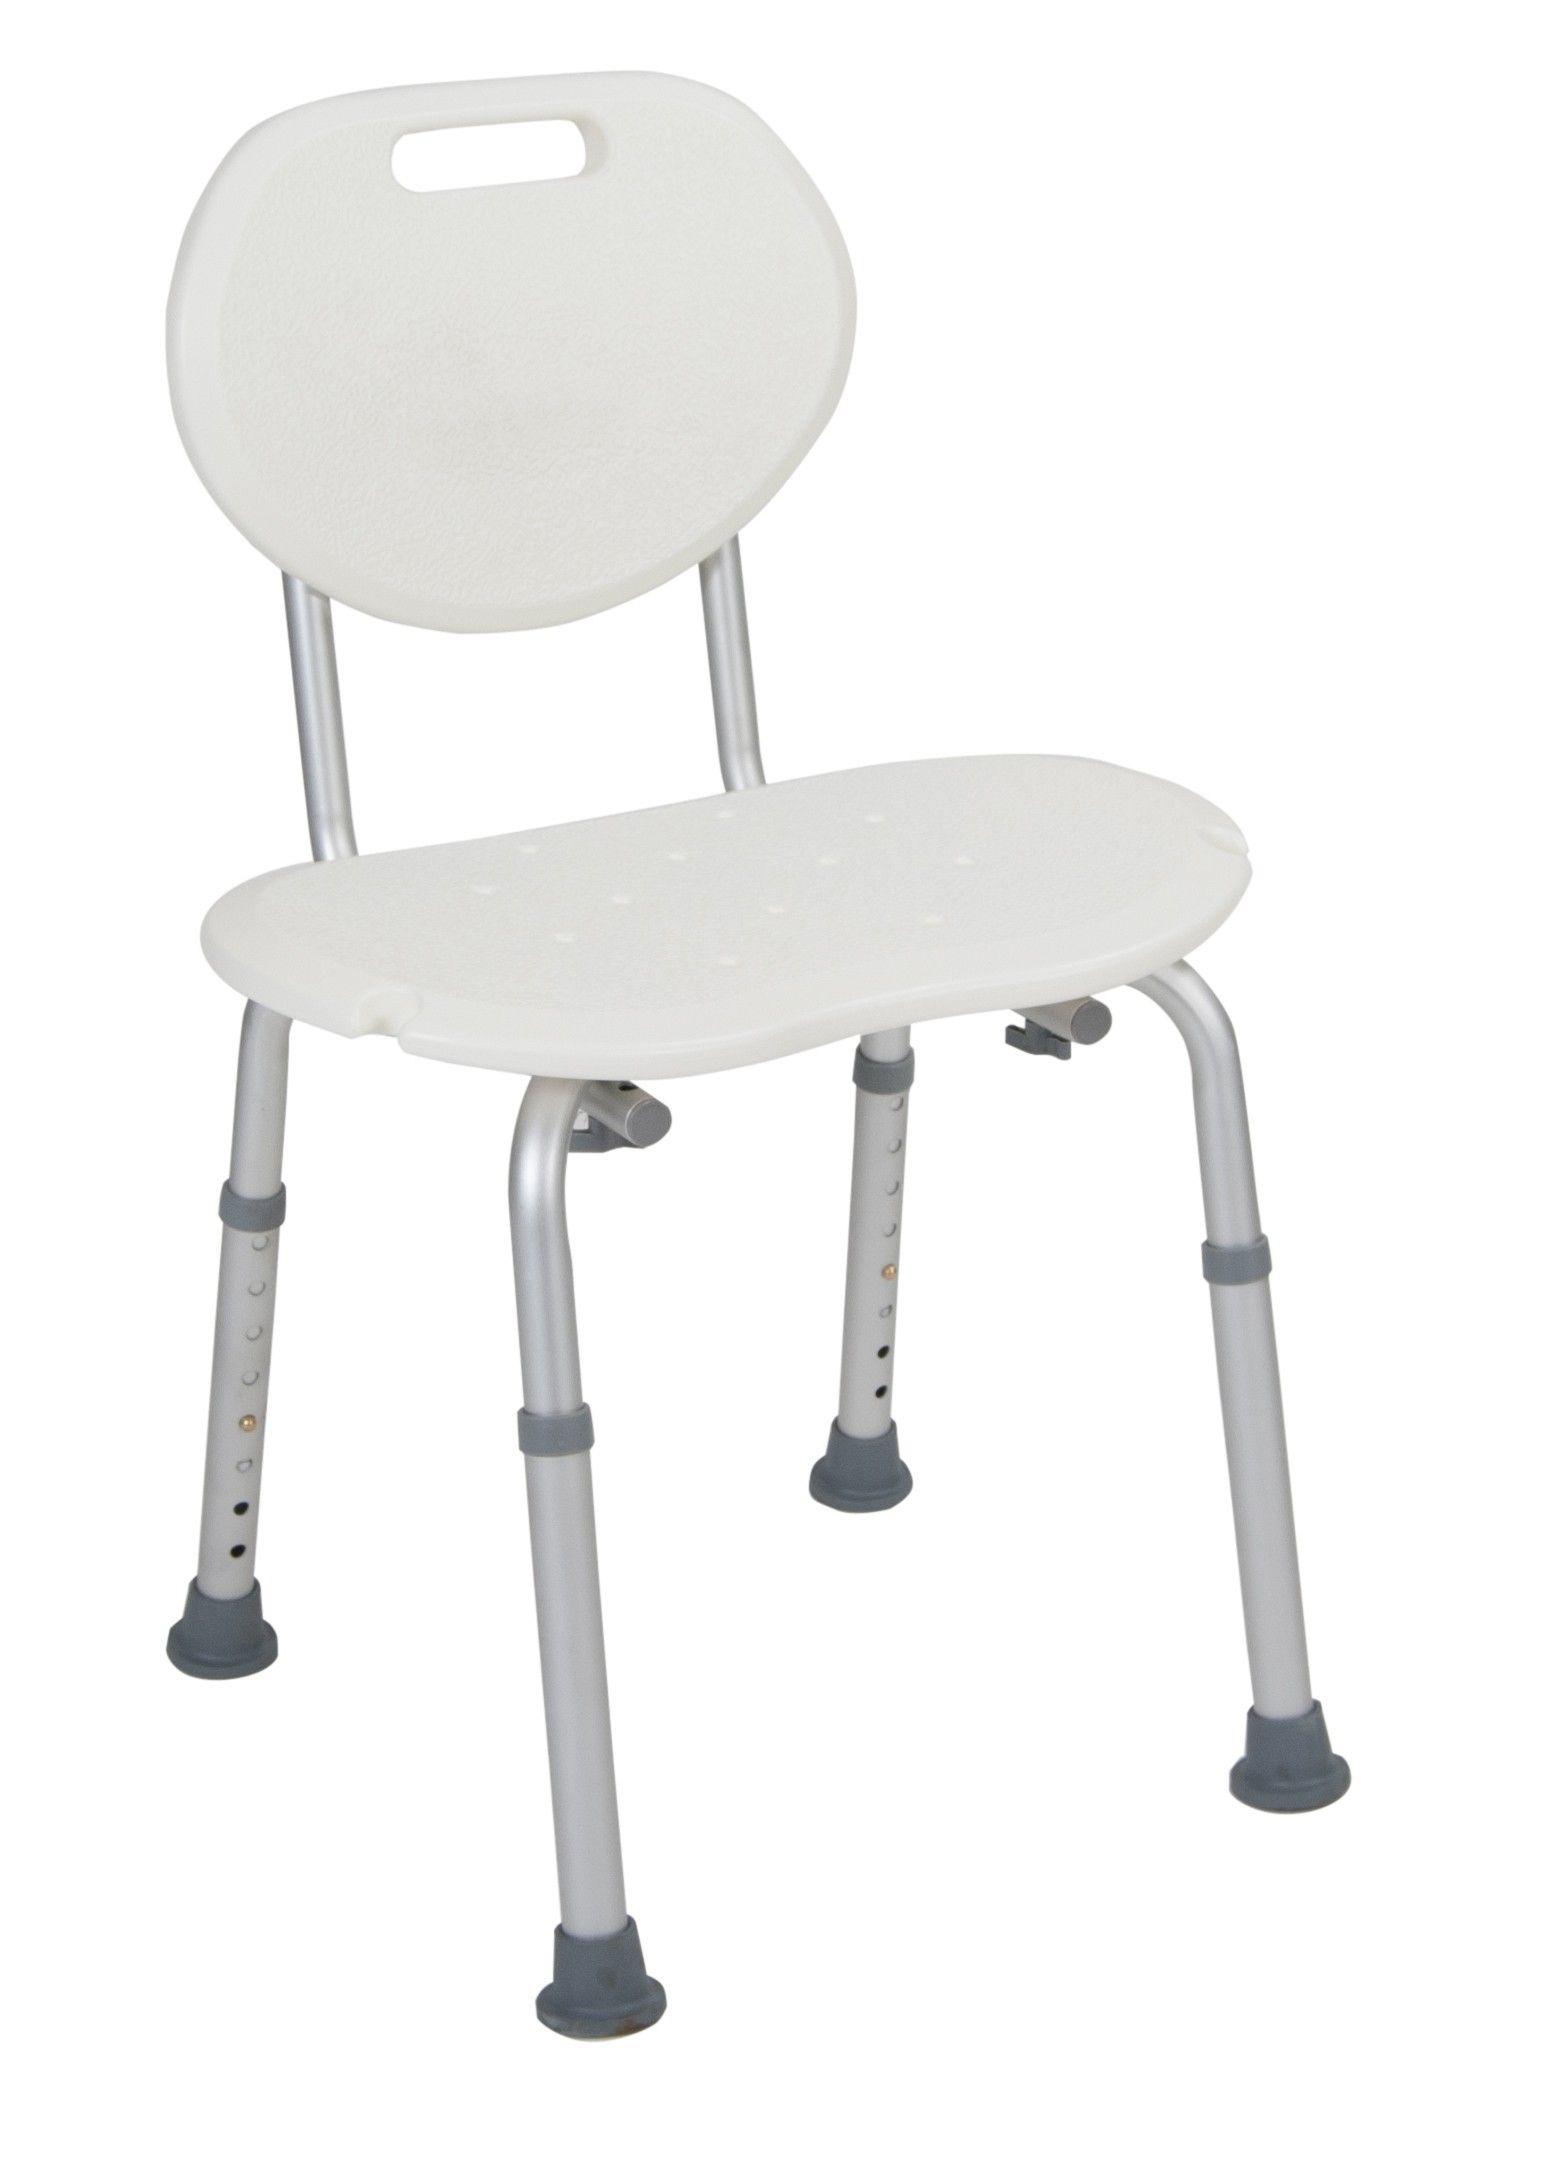 handicap shower chairs 3 legged chair comfort for elderly equipment bathtub disabled person bench